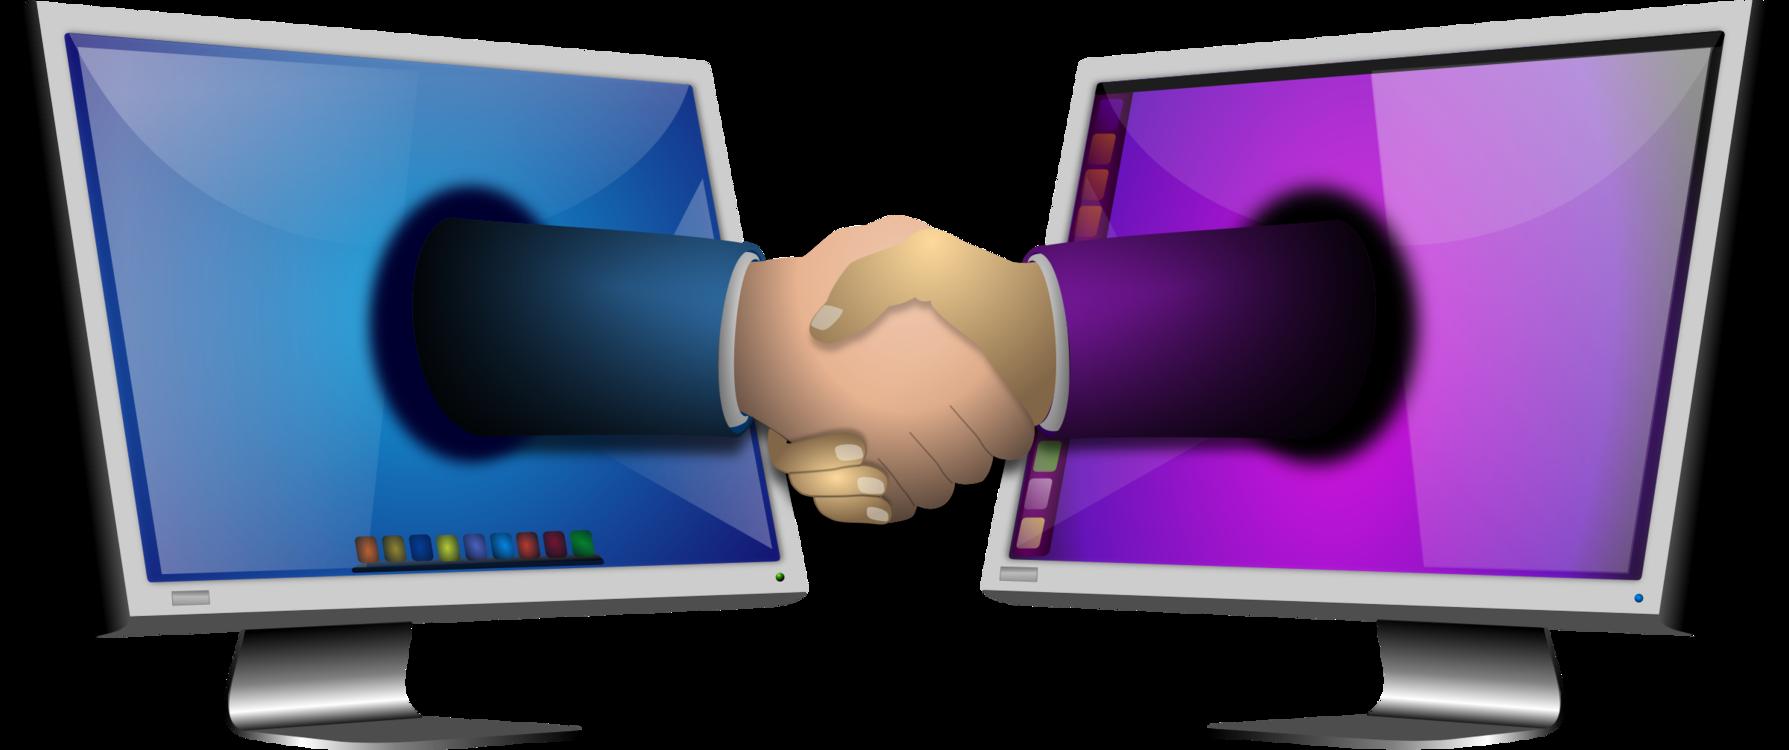 Computer Monitor,Desktop Computer,Lcd Tv